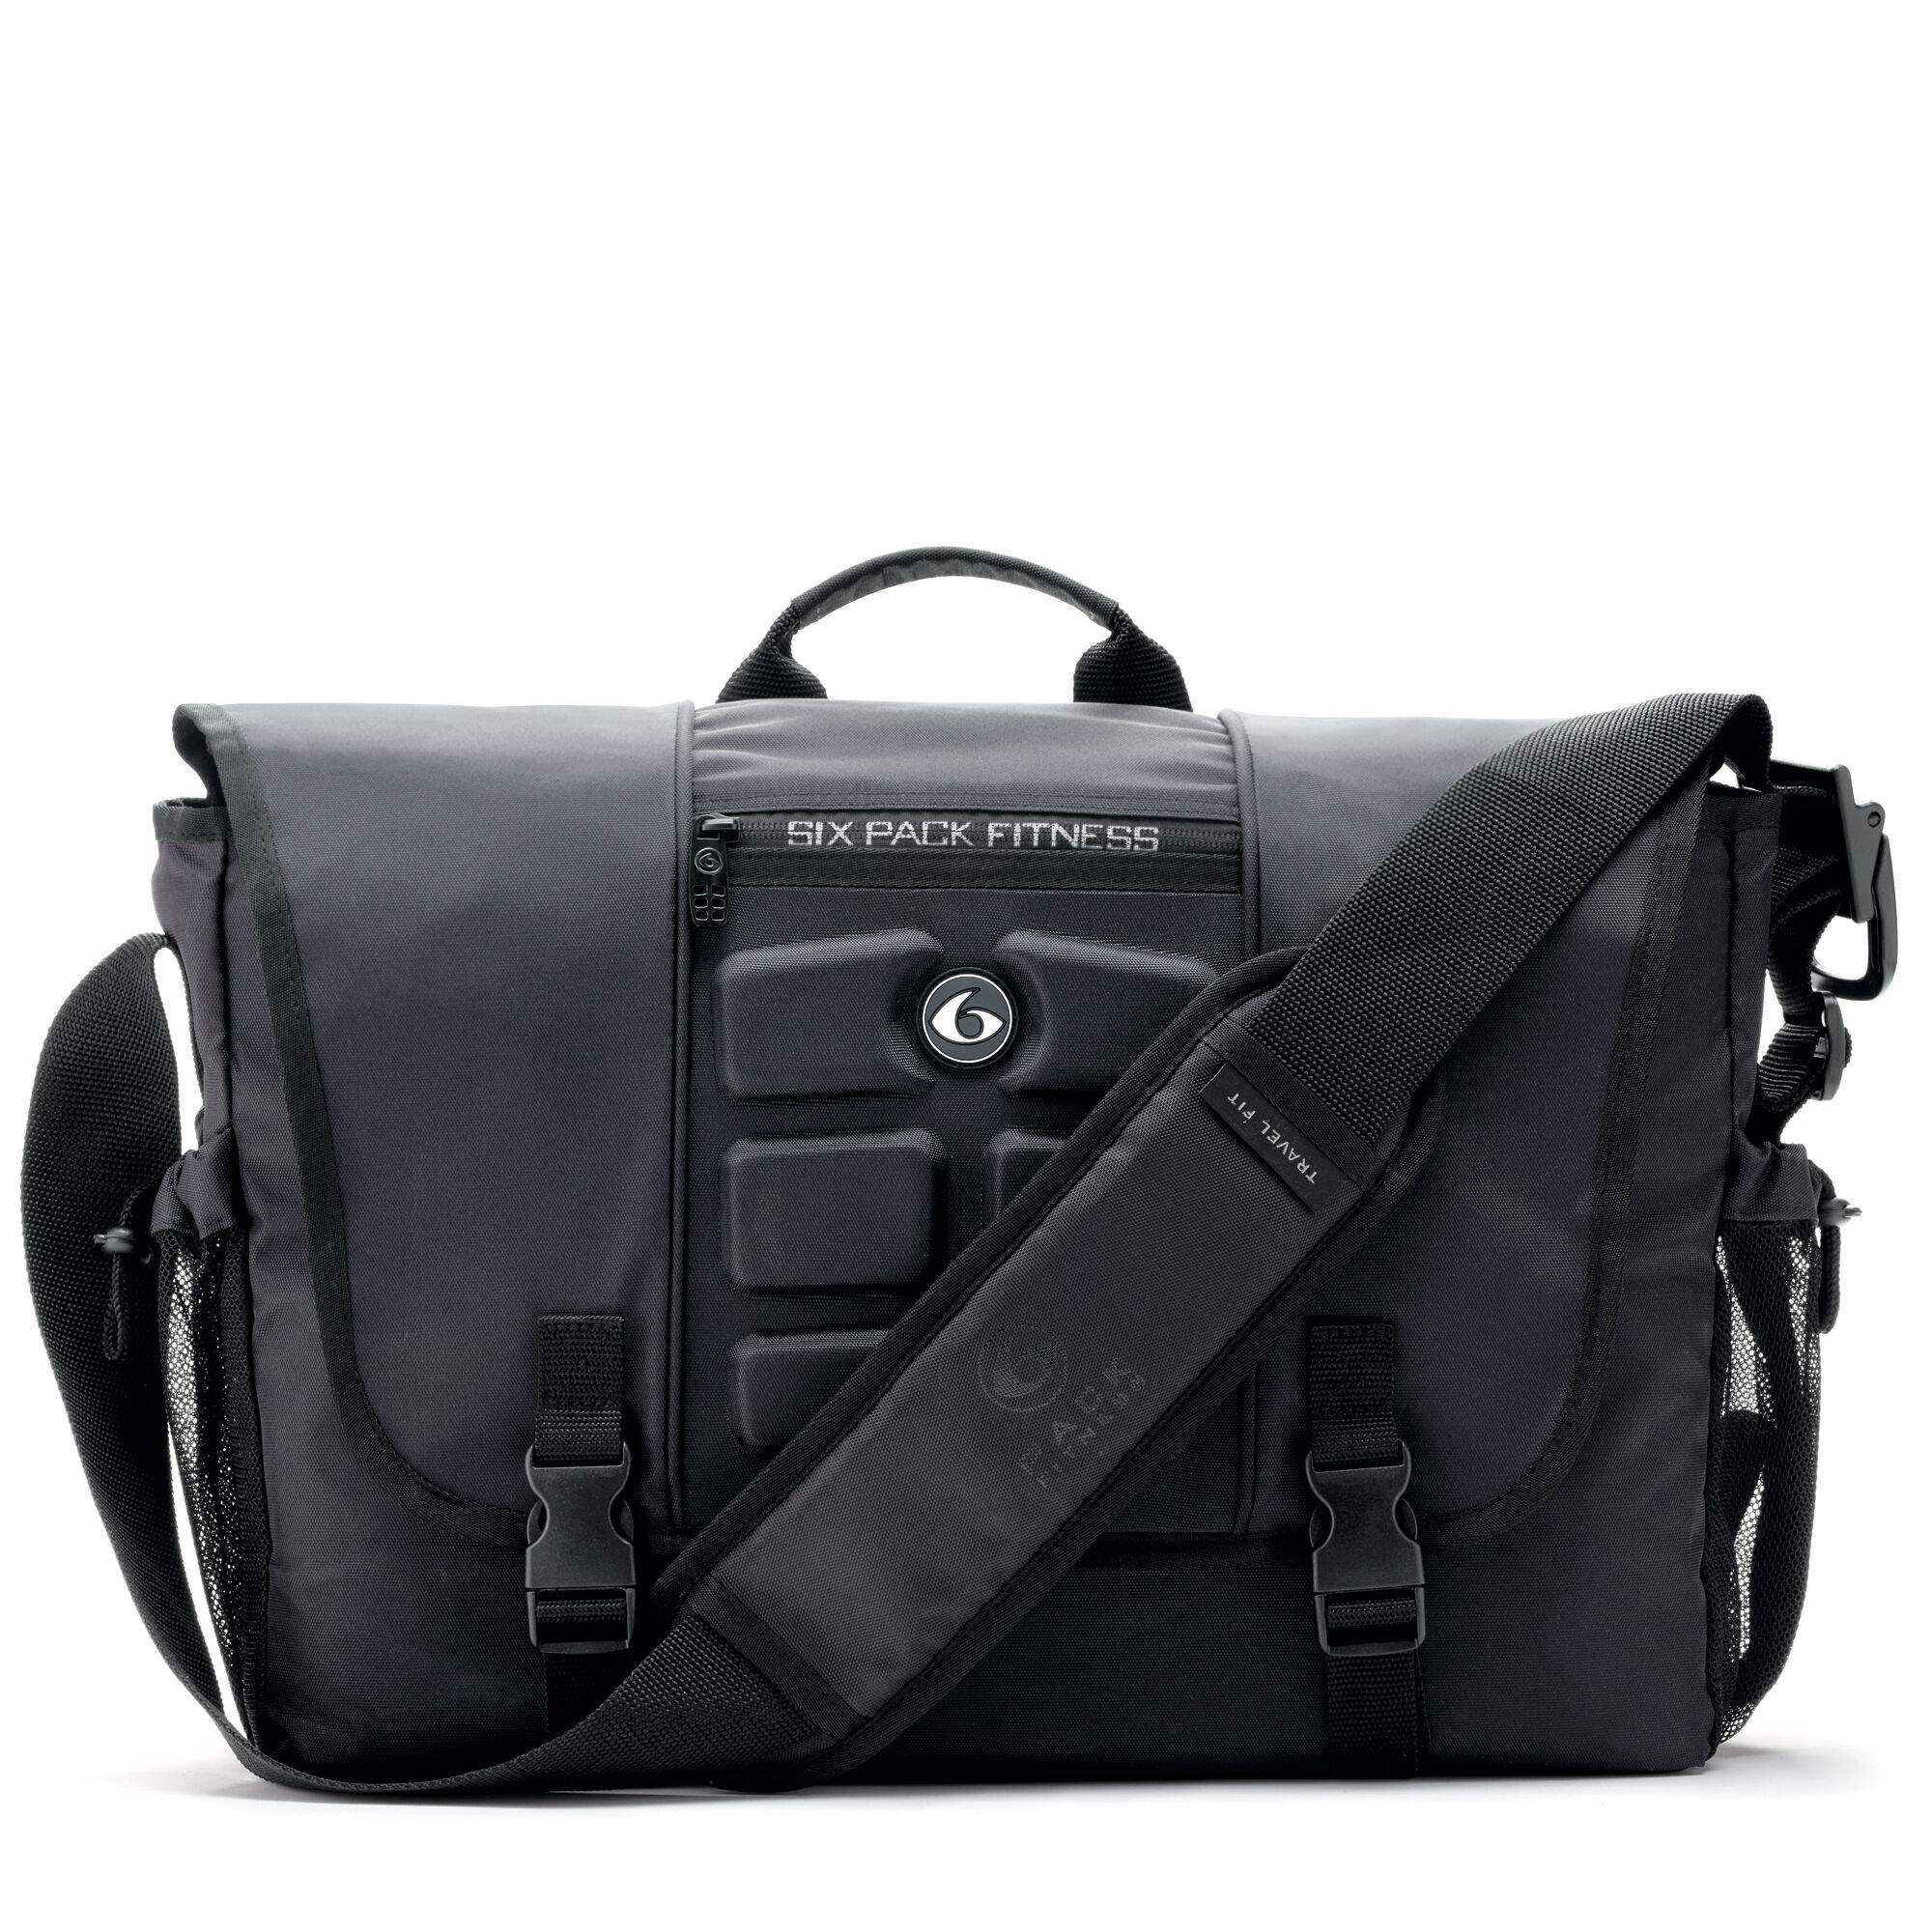 6 Pack Fitness™ Titan Messenger - Stealth   GNC